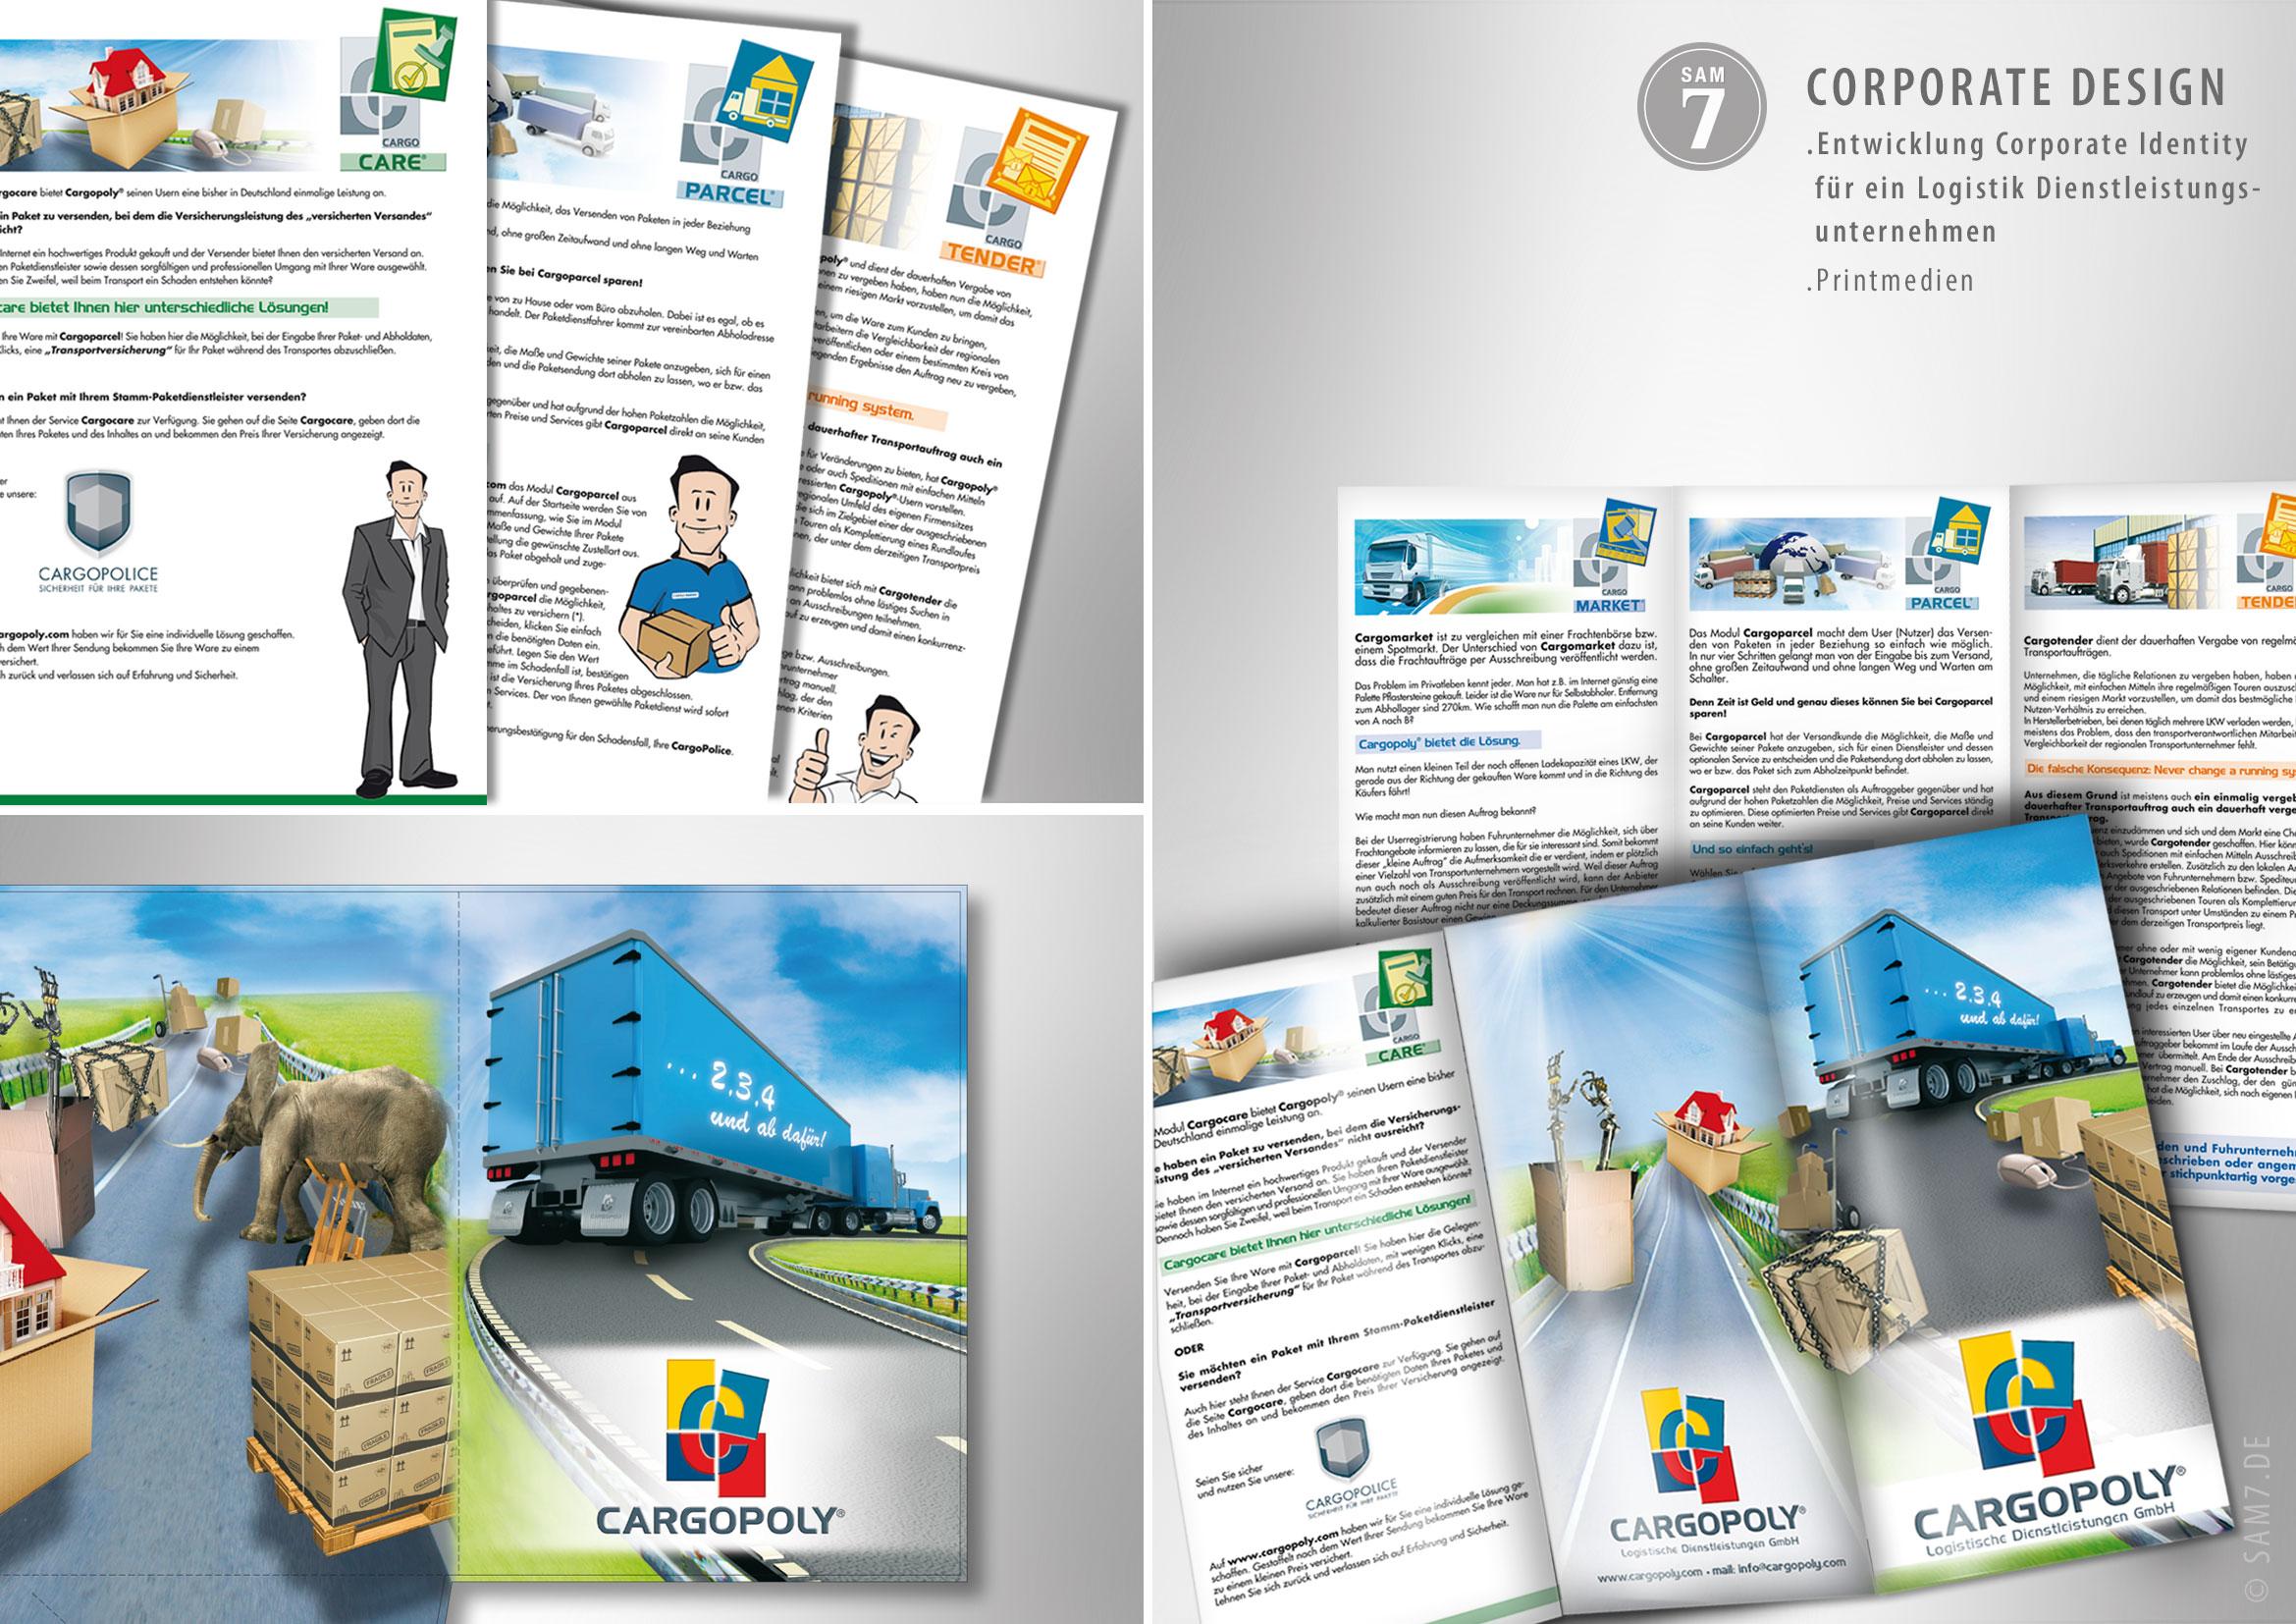 Print Media Design. Cargopoly®.